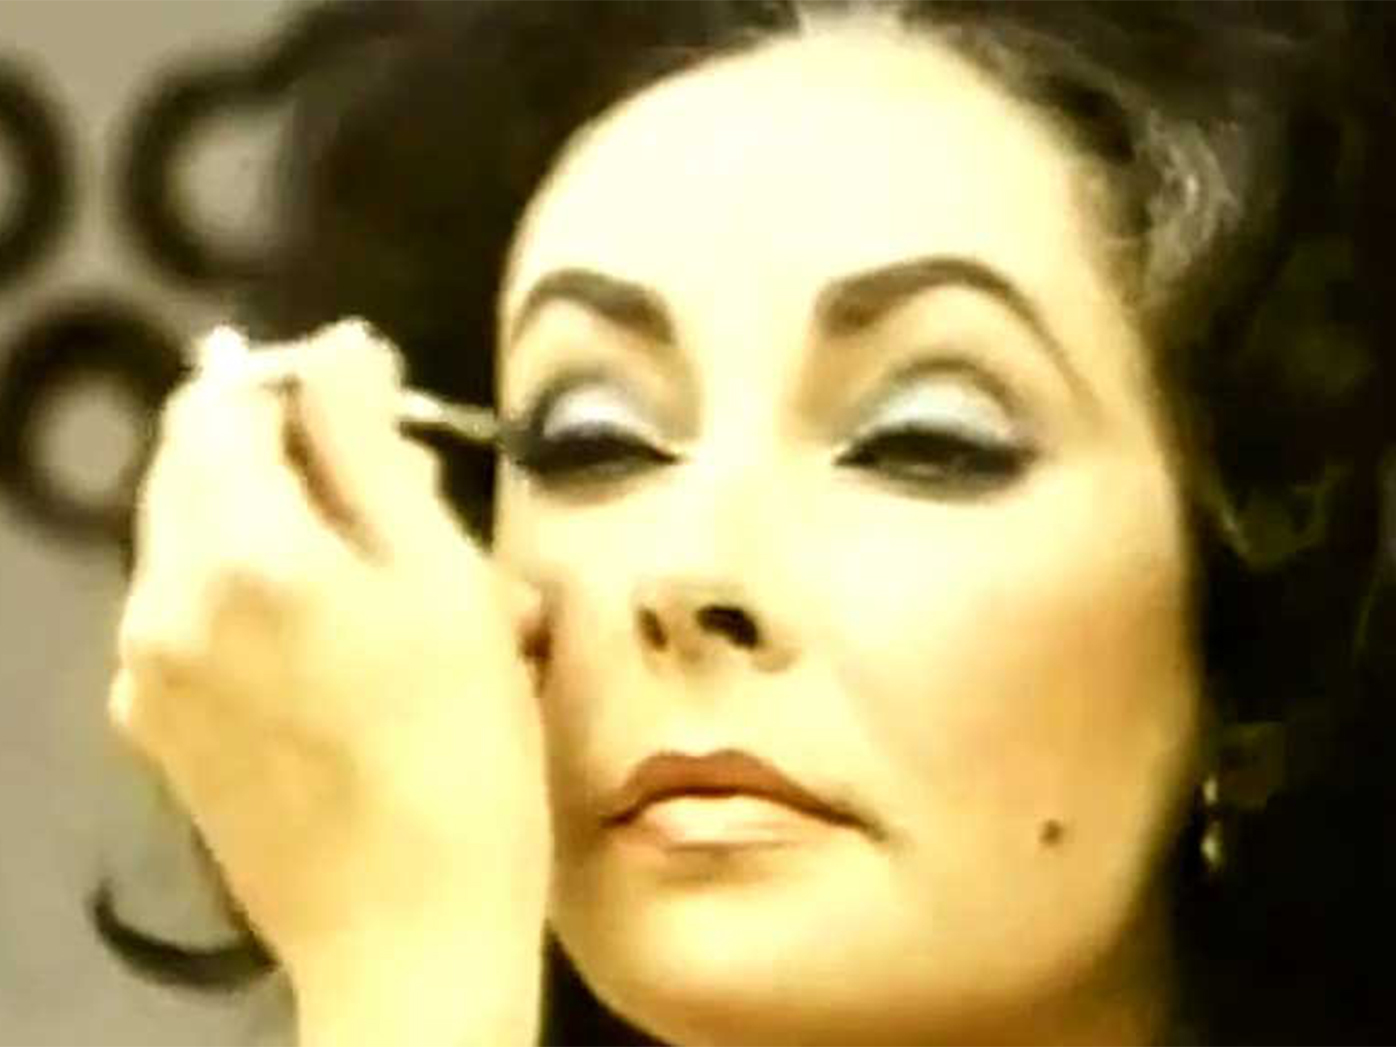 Mastering the winged eye courtesy of Elizabeth Taylor herself